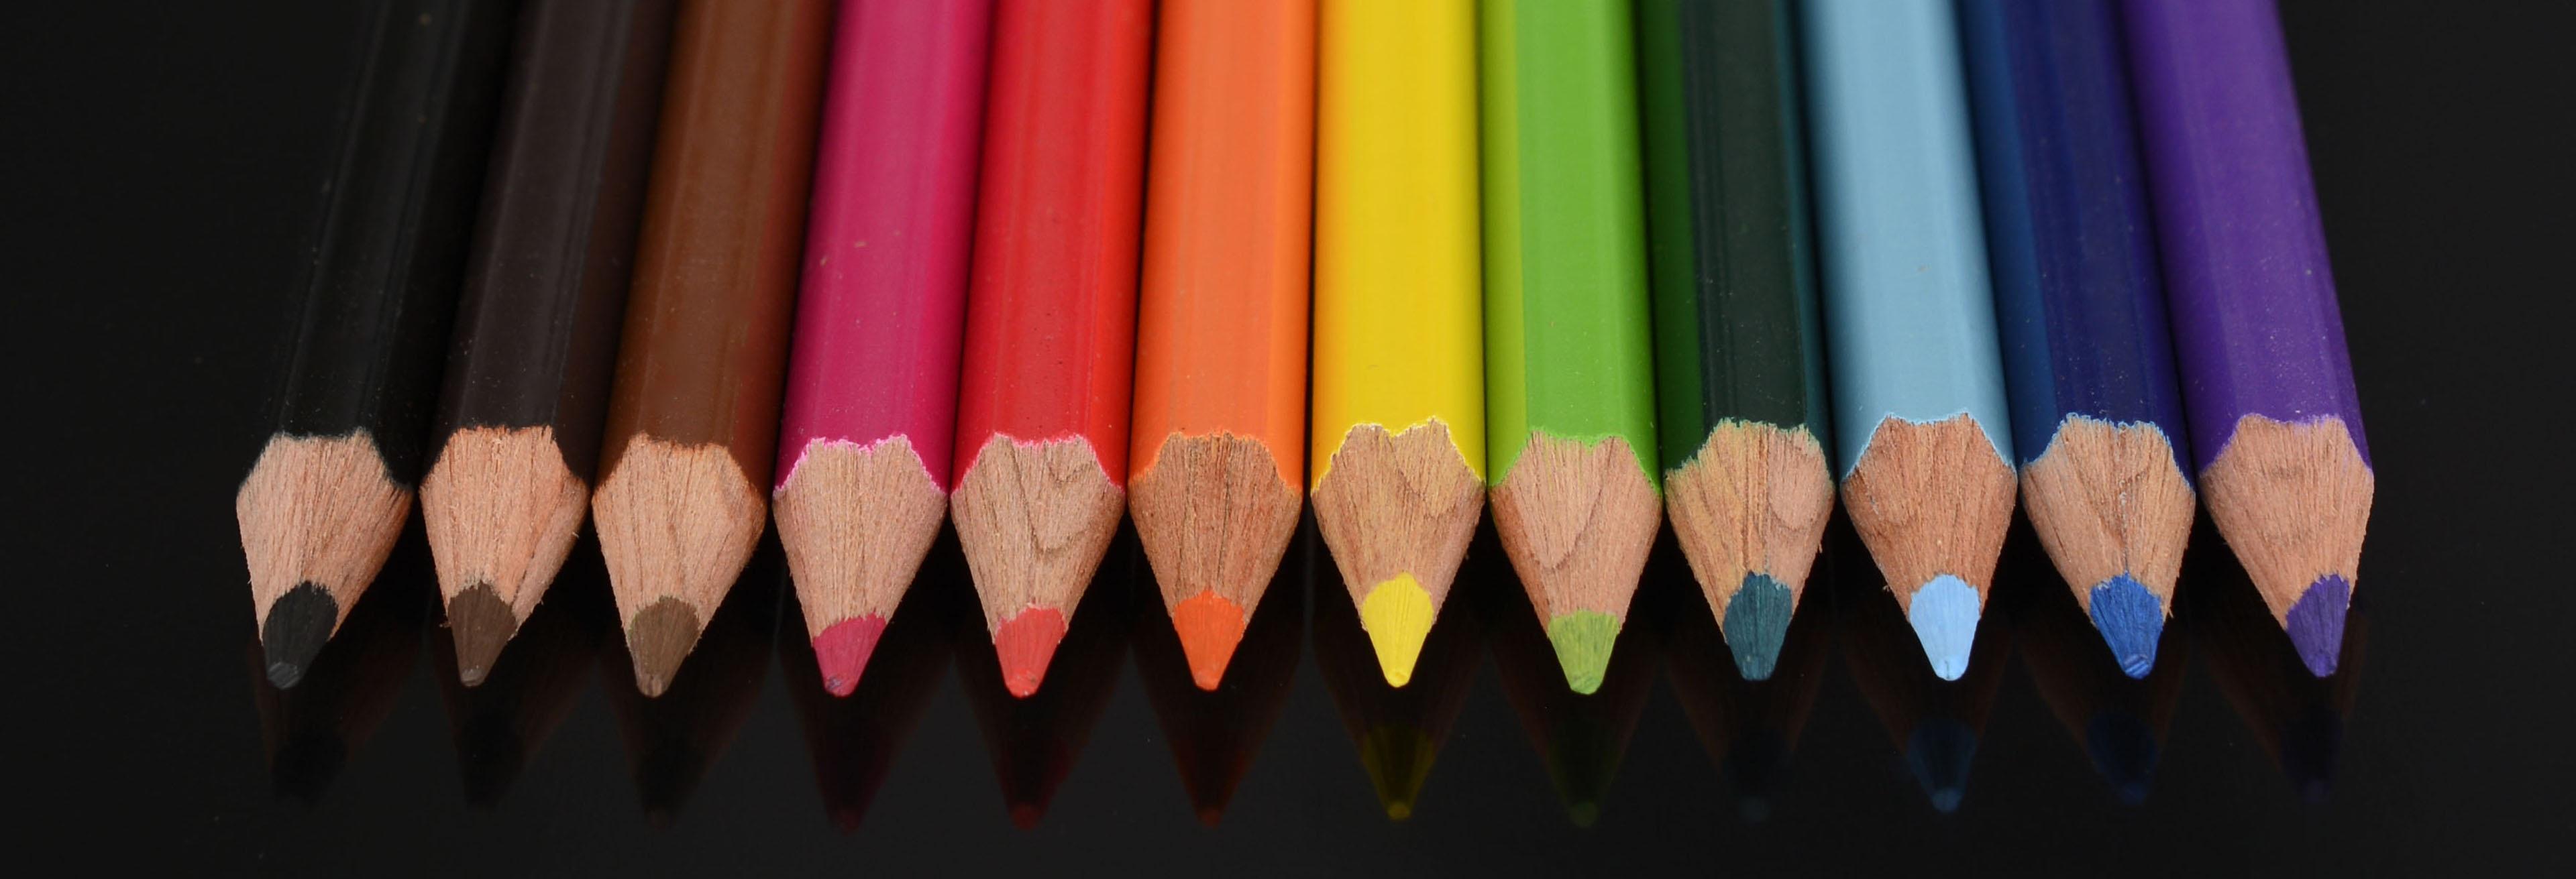 free images pencil wood color banner paint colorful pens